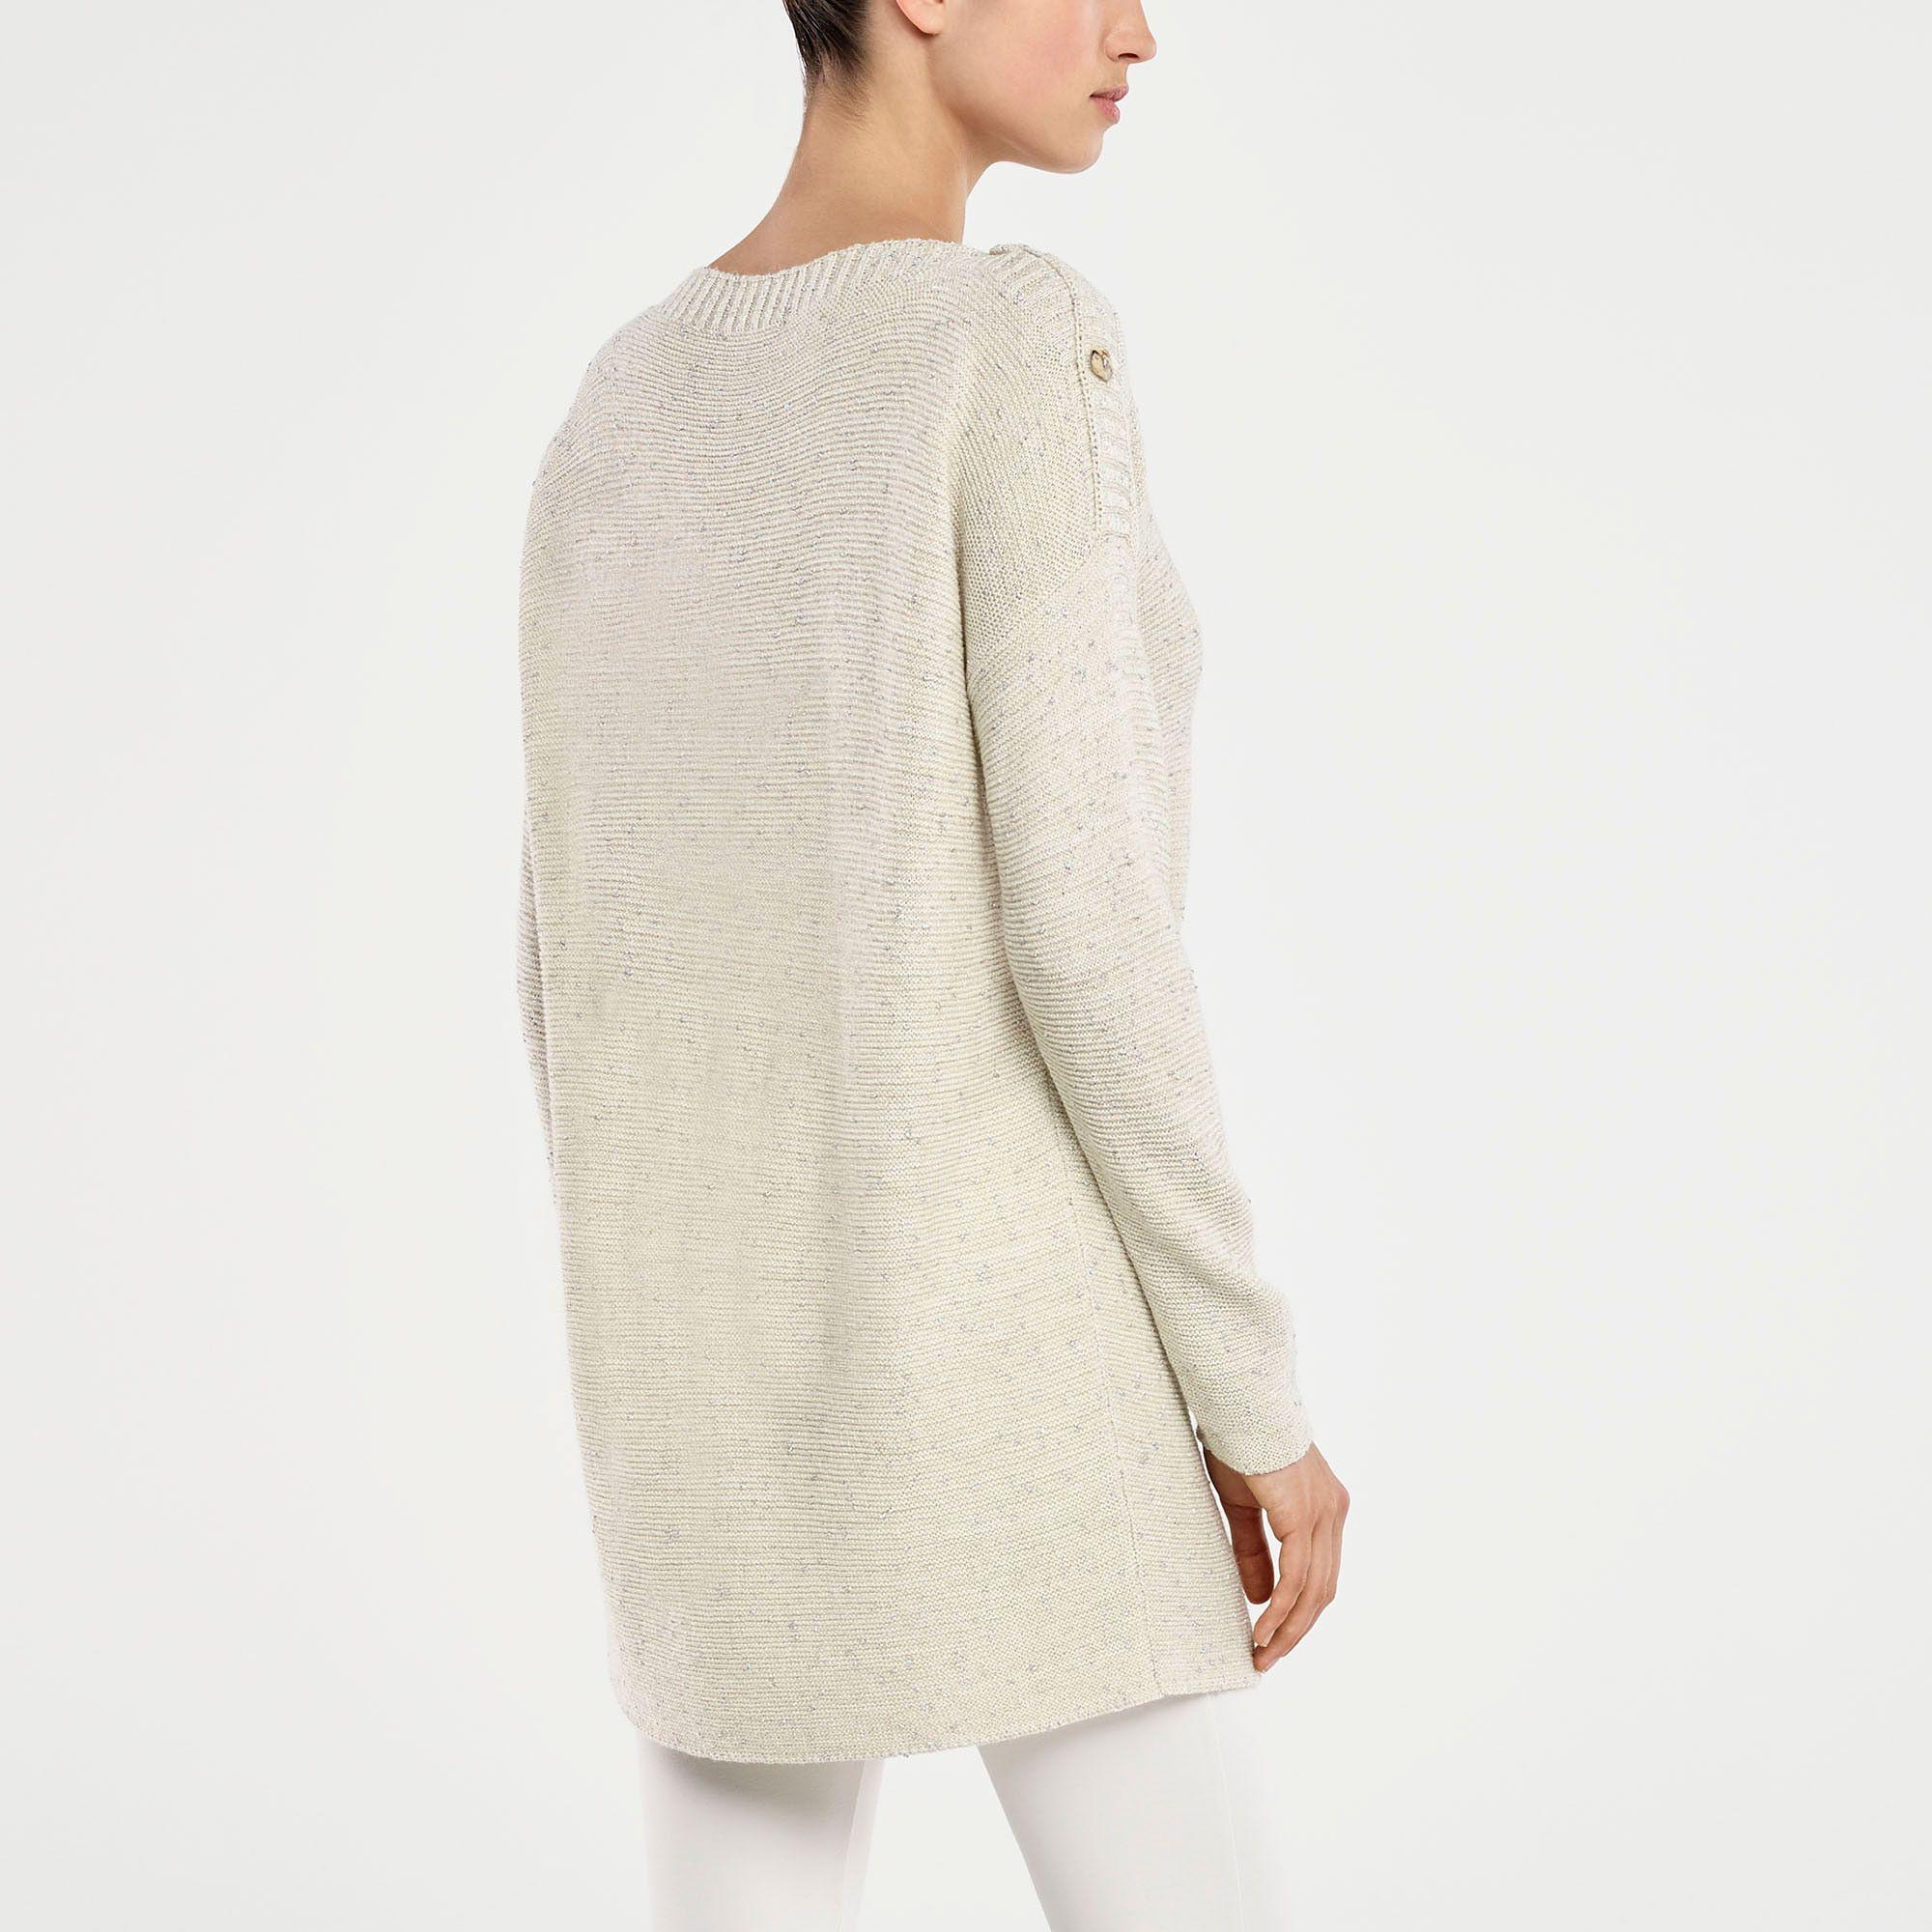 Gebroken witte lange trui glanzende stof Sarah Pacini